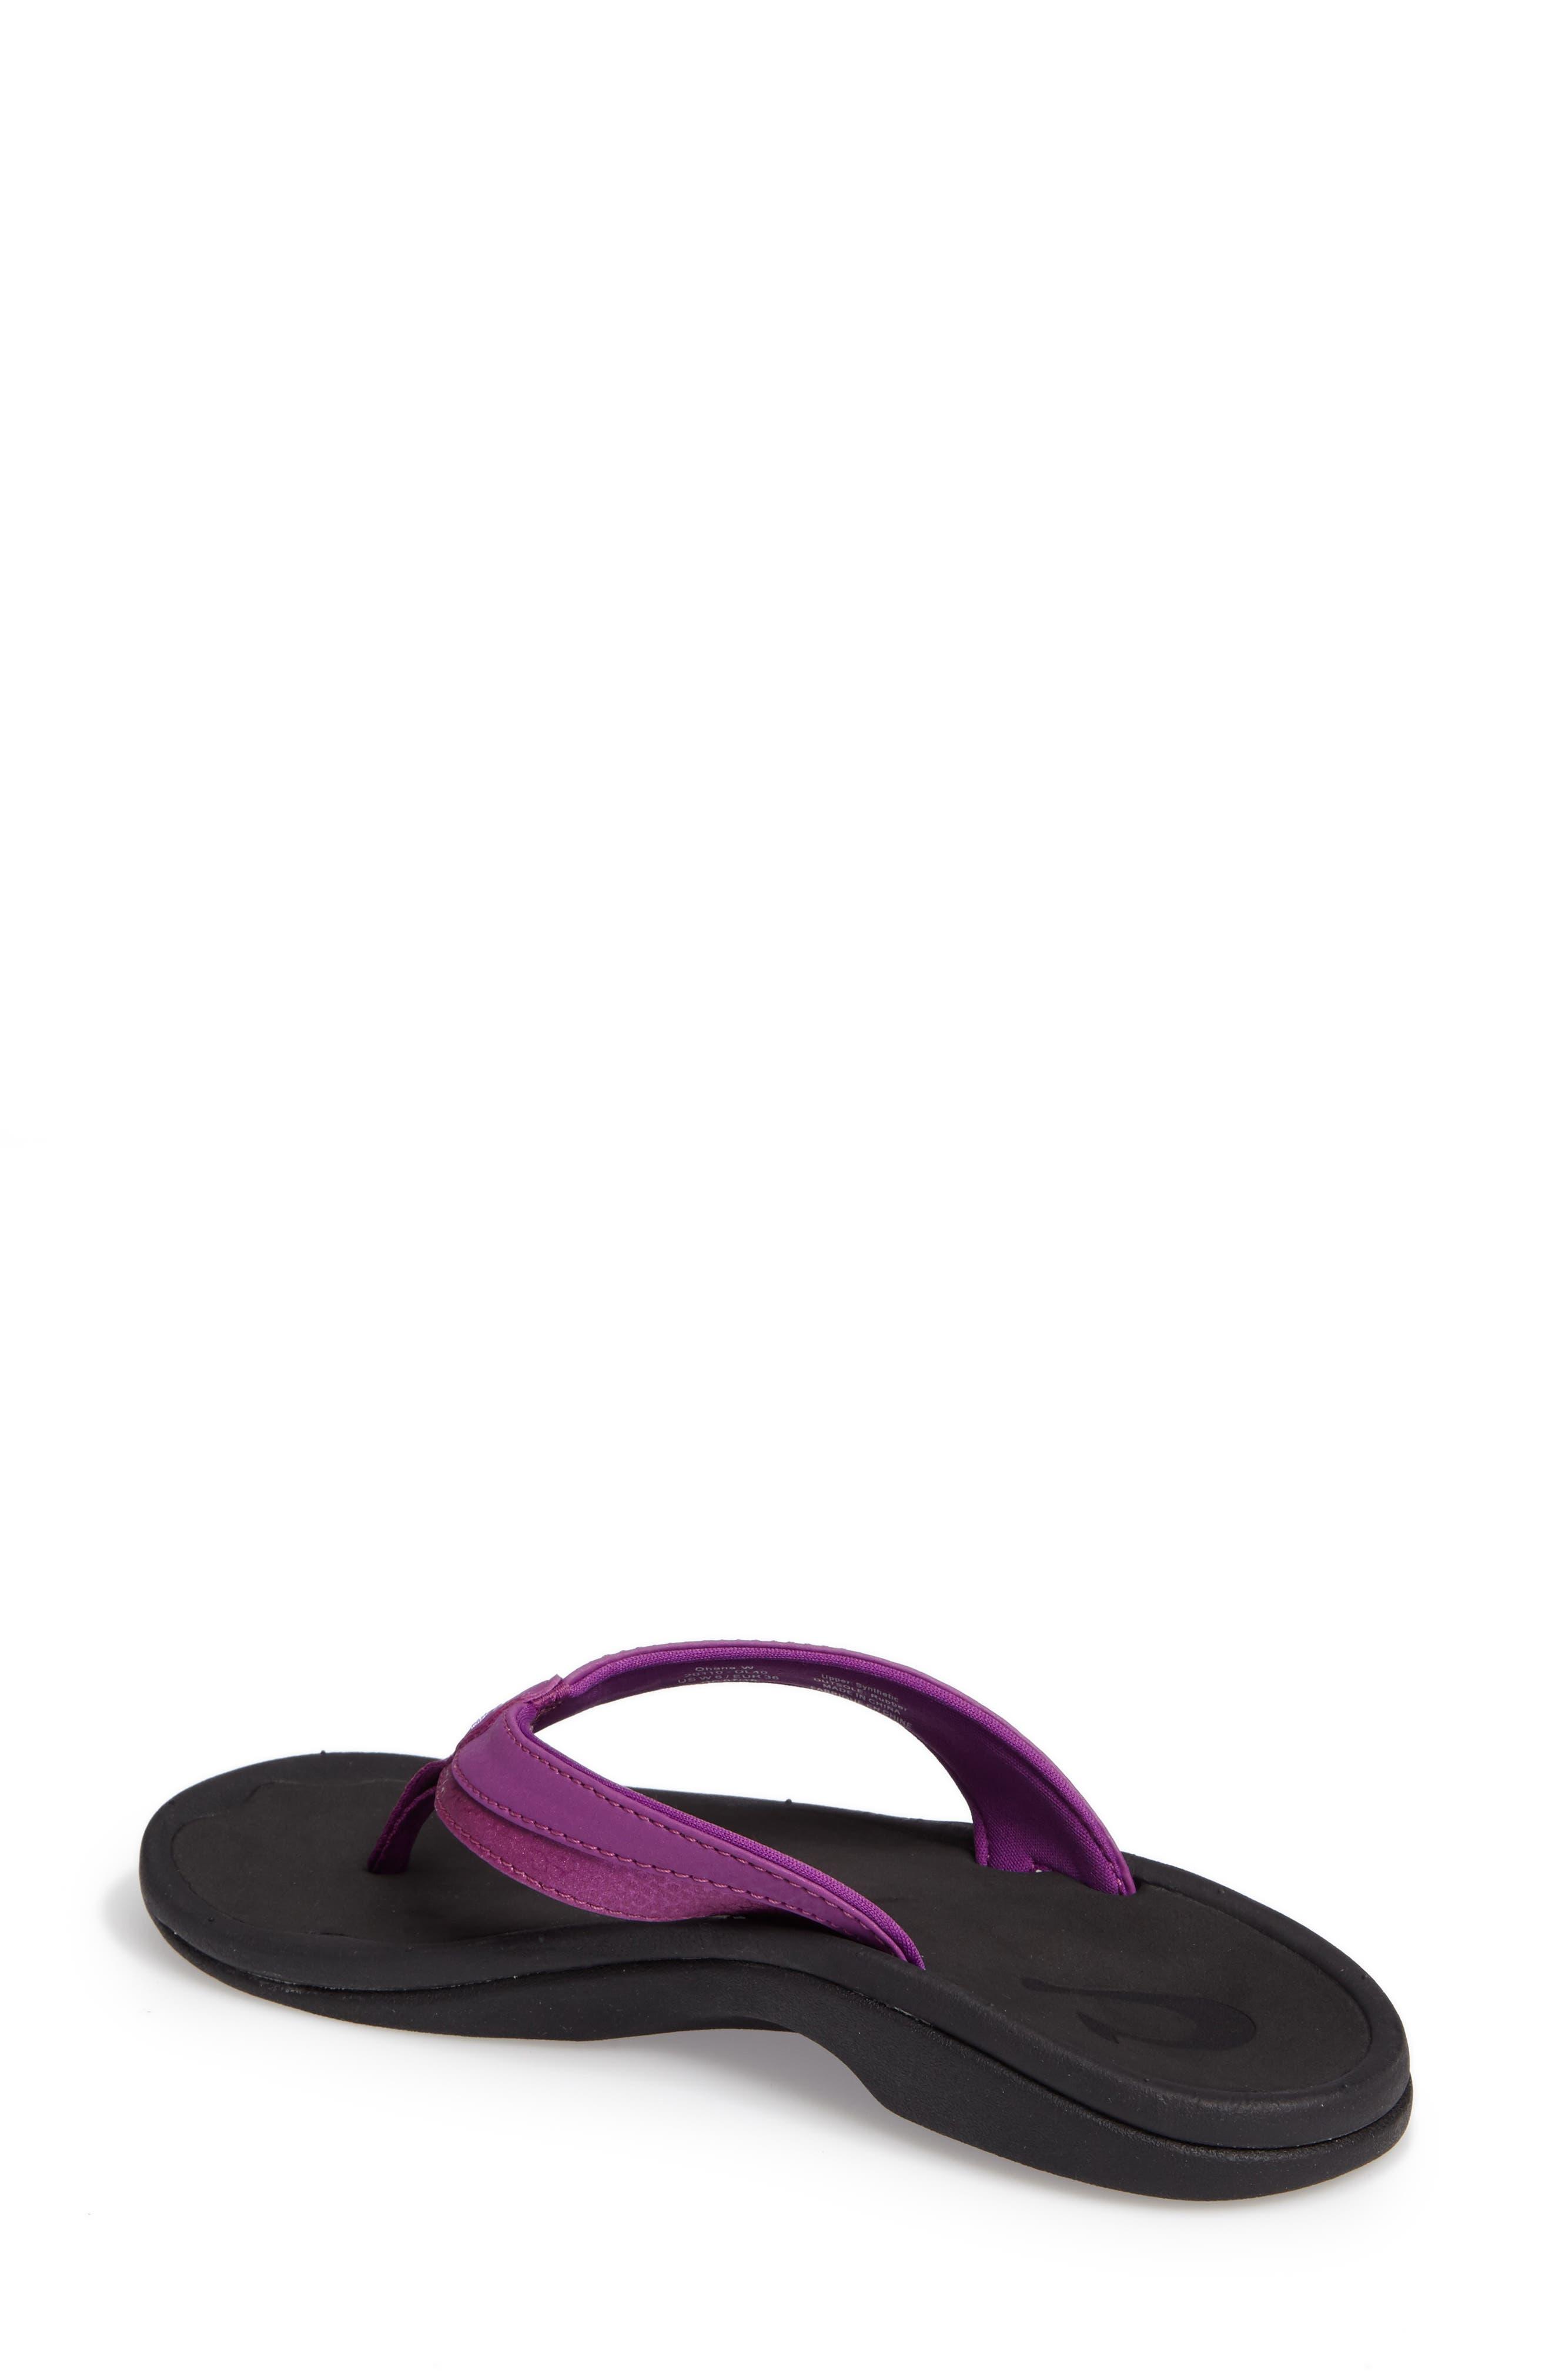 Ohana Sandal,                             Alternate thumbnail 2, color,                             Dahlia/ Black Faux Leather